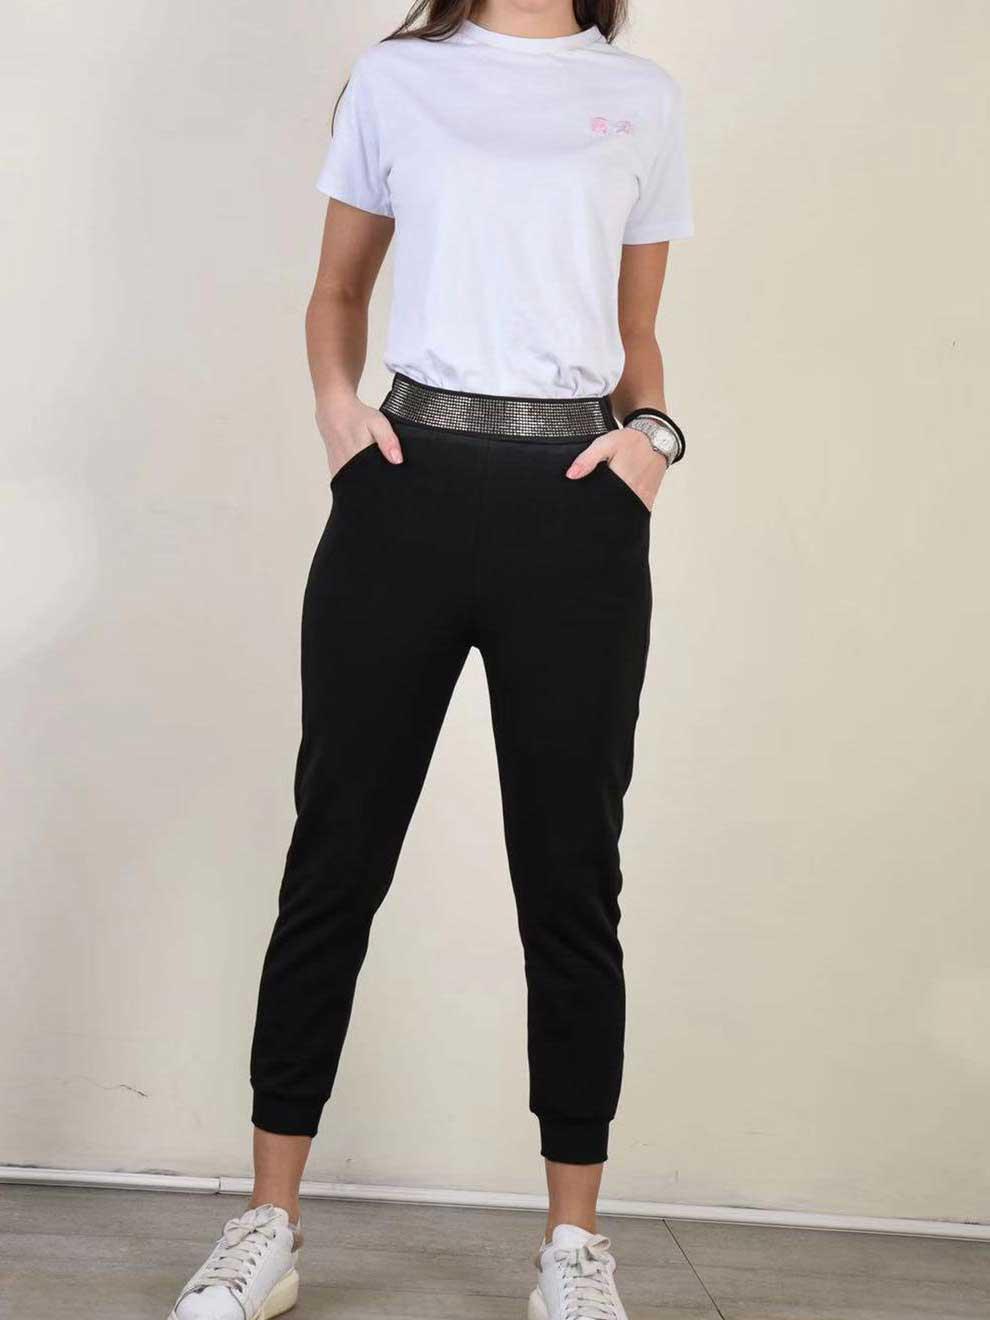 Pantalone nero comodo nero